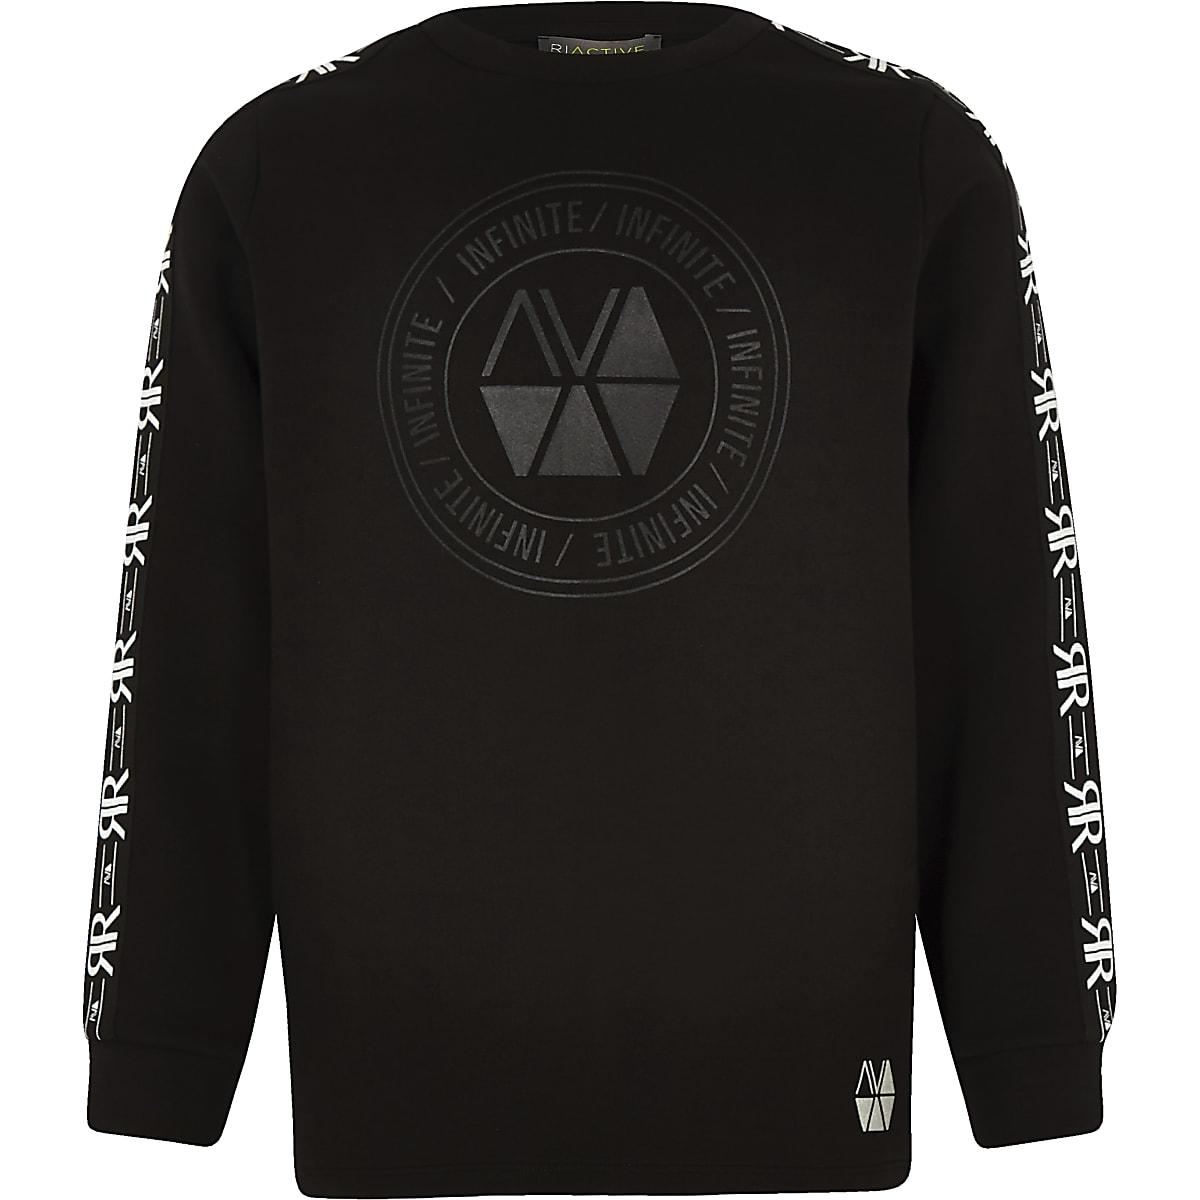 Boys RI Active black sweatshirt